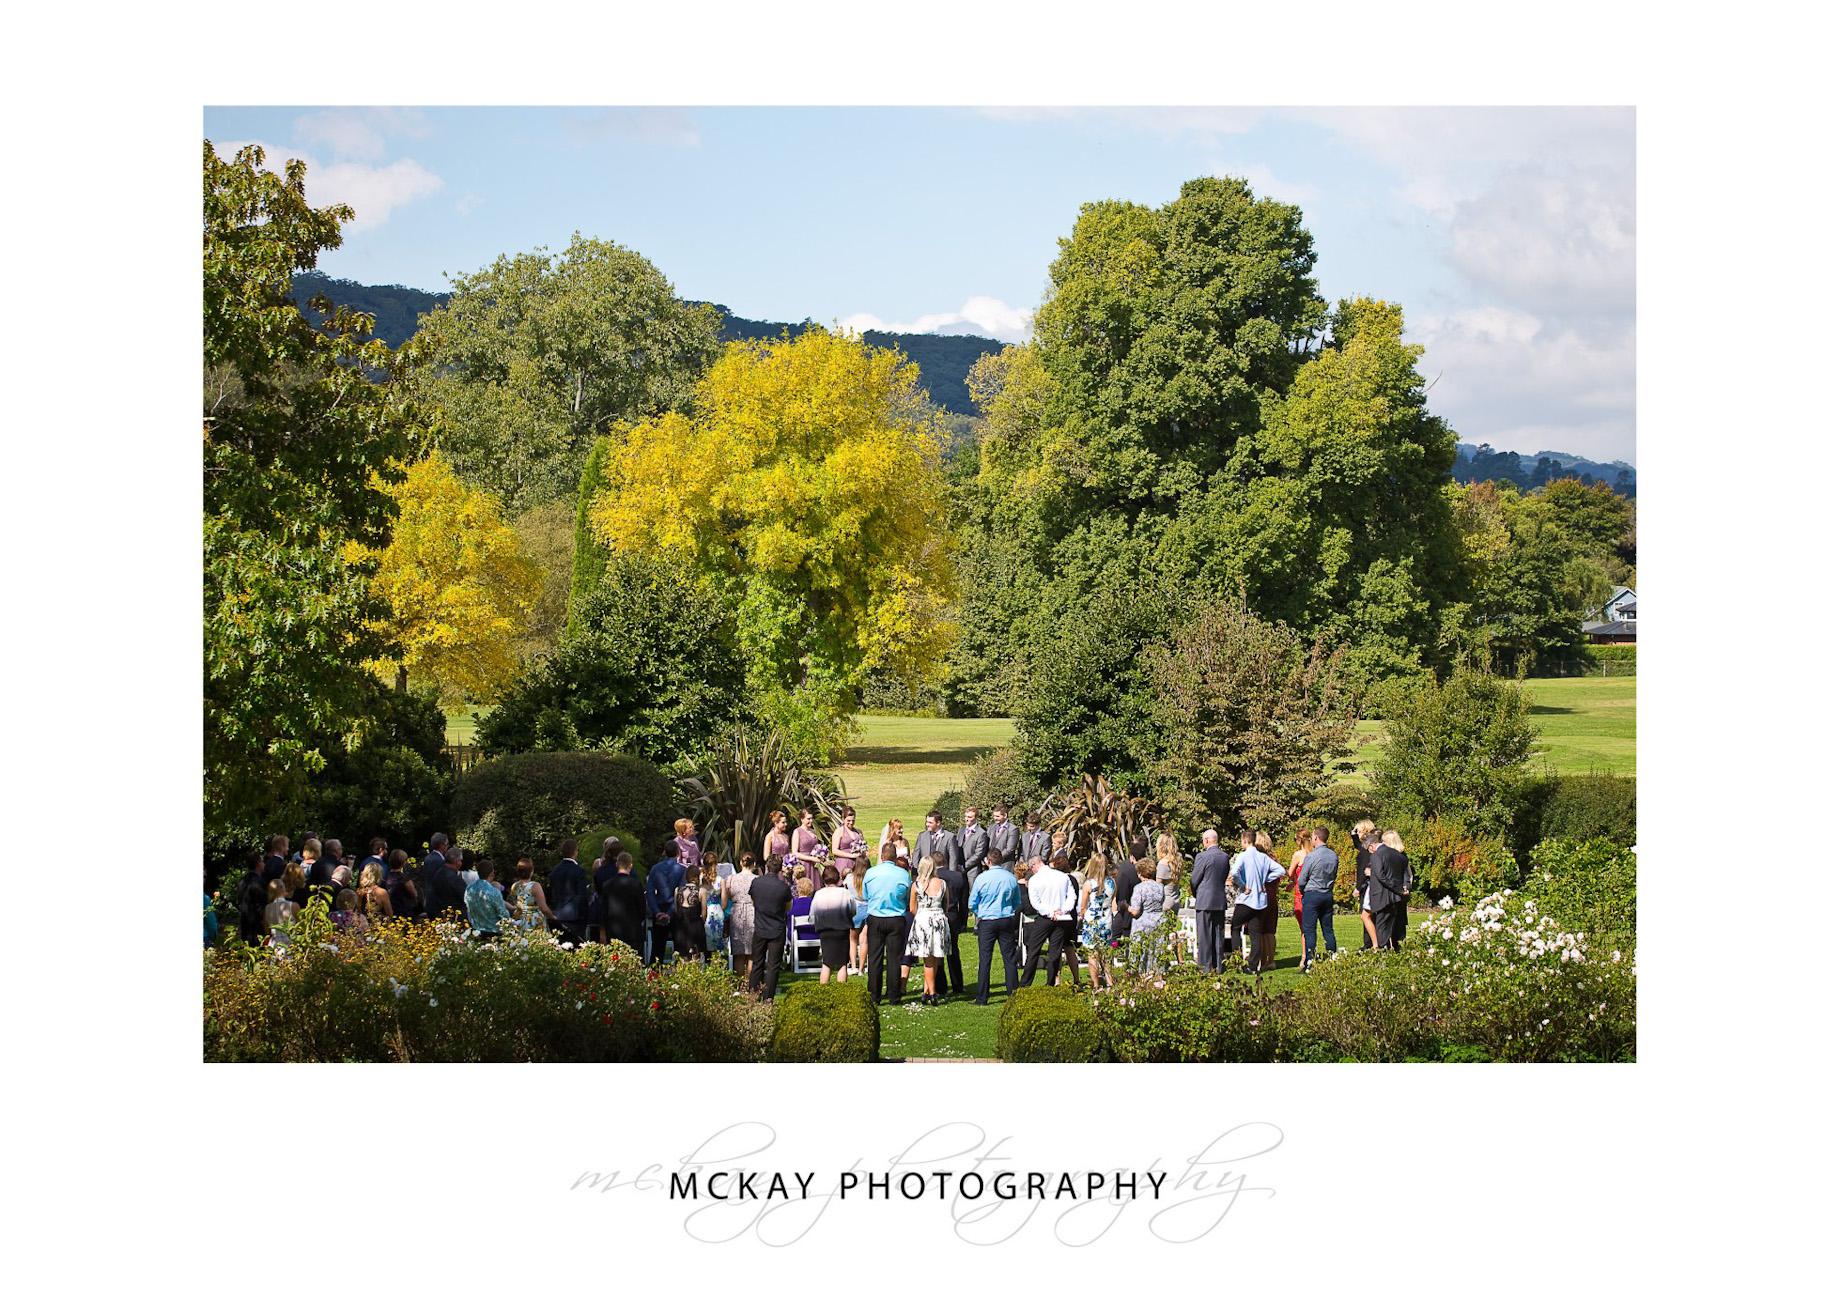 Lawn wedding ceremony at Peppers Craigieburn Bowral